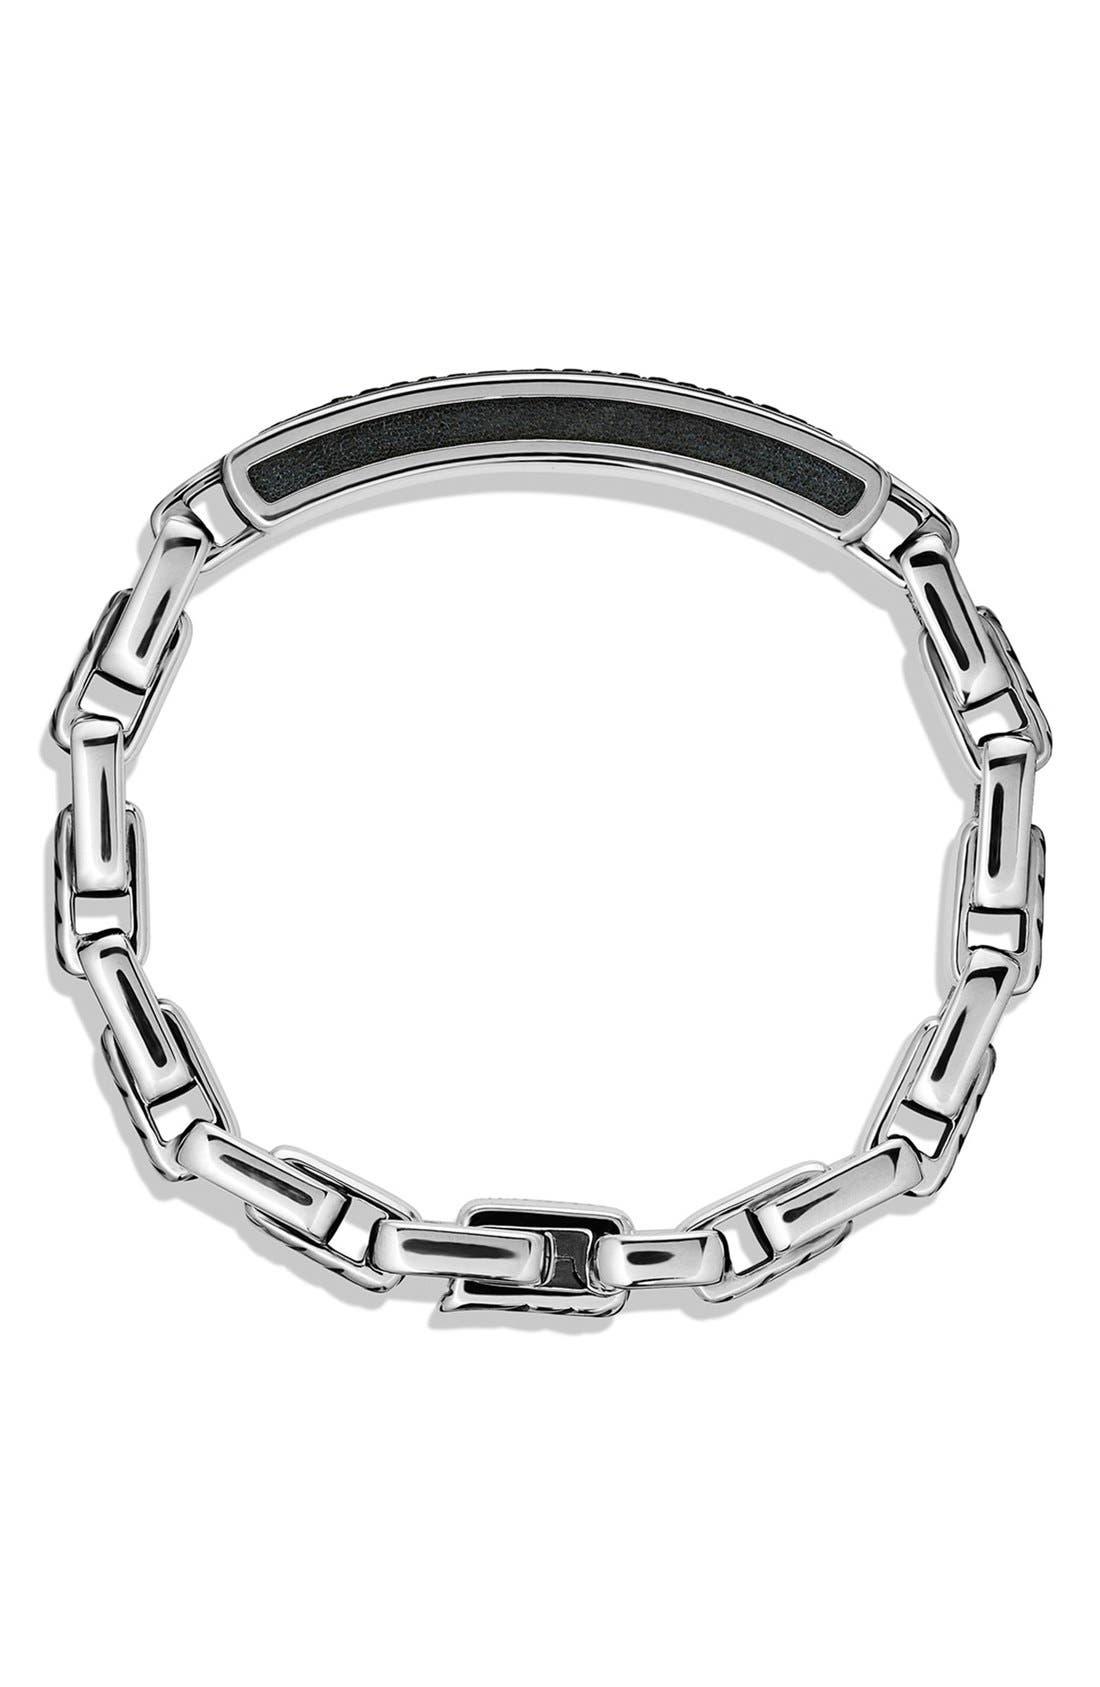 Alternate Image 2  - David Yurman 'Modern Cable' ID Bracelet with Black Diamonds